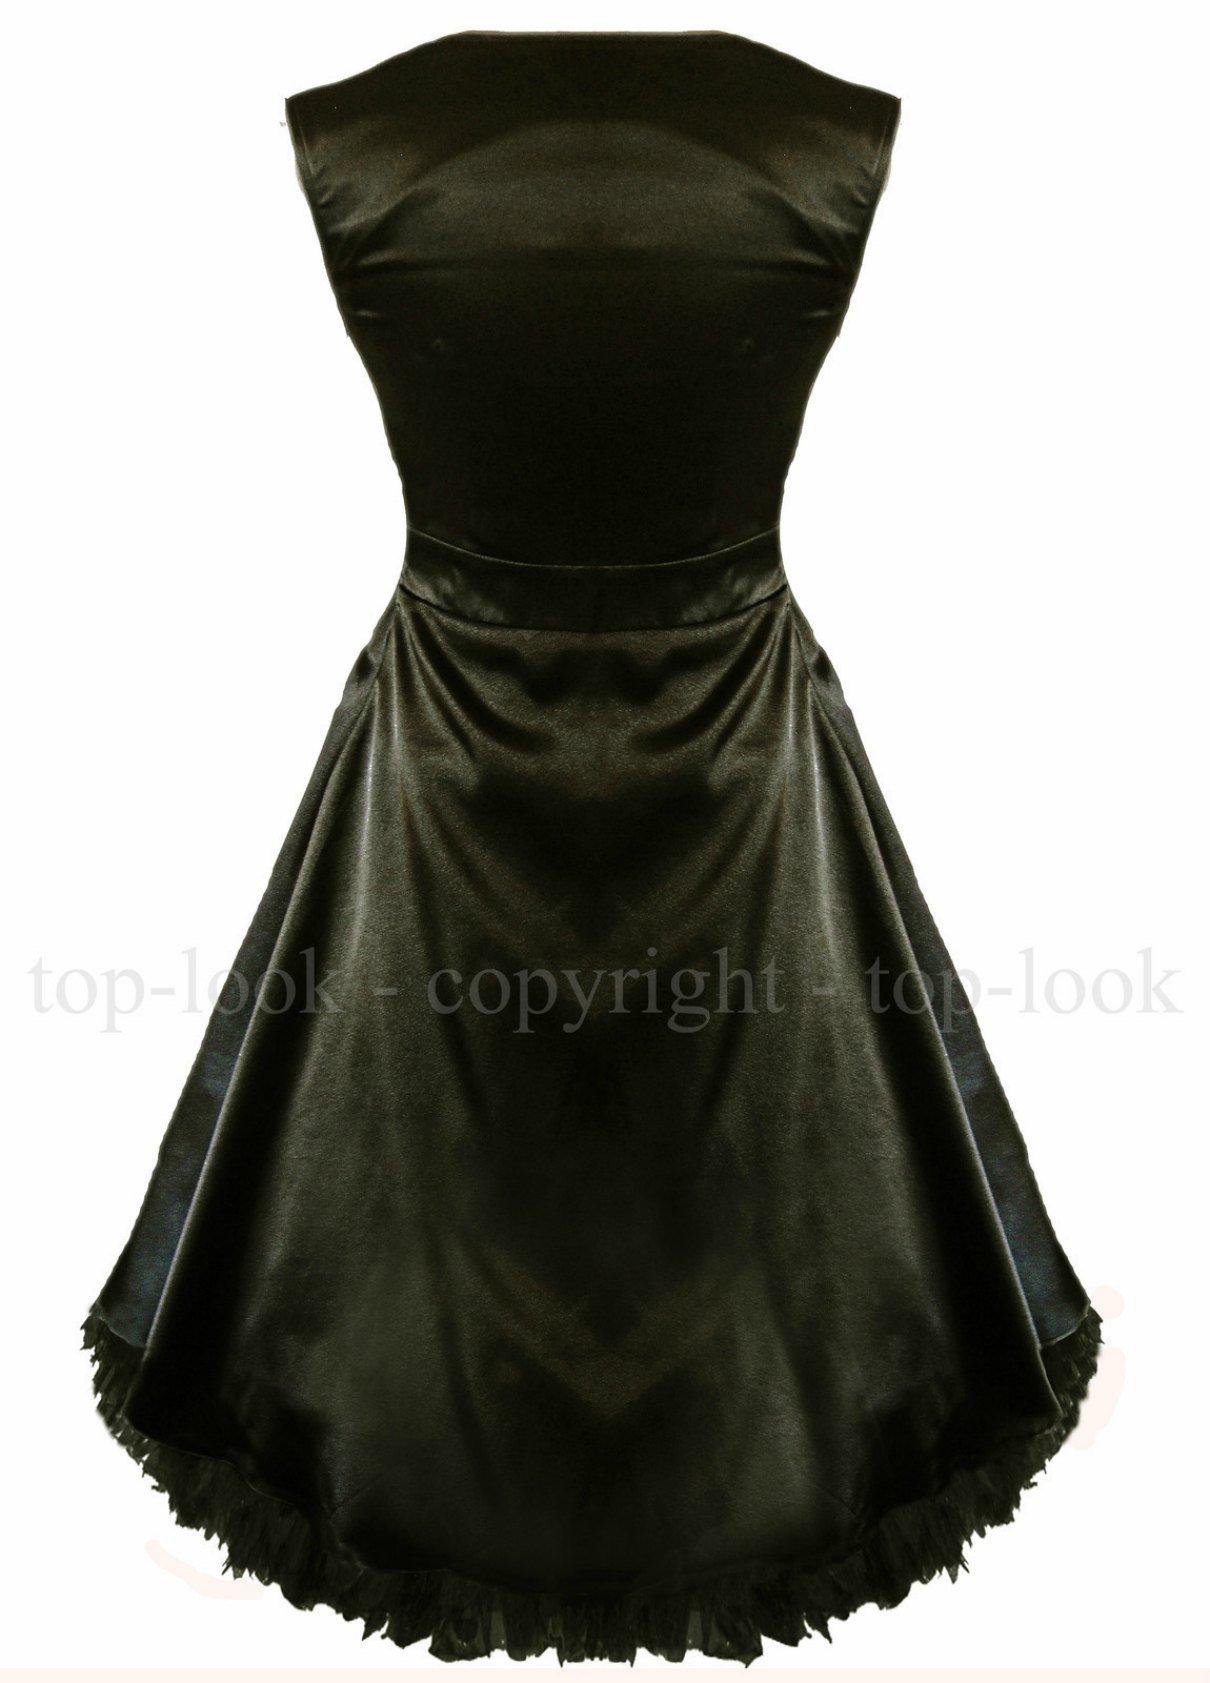 Enlarge Black Satin Bow Prom Dress